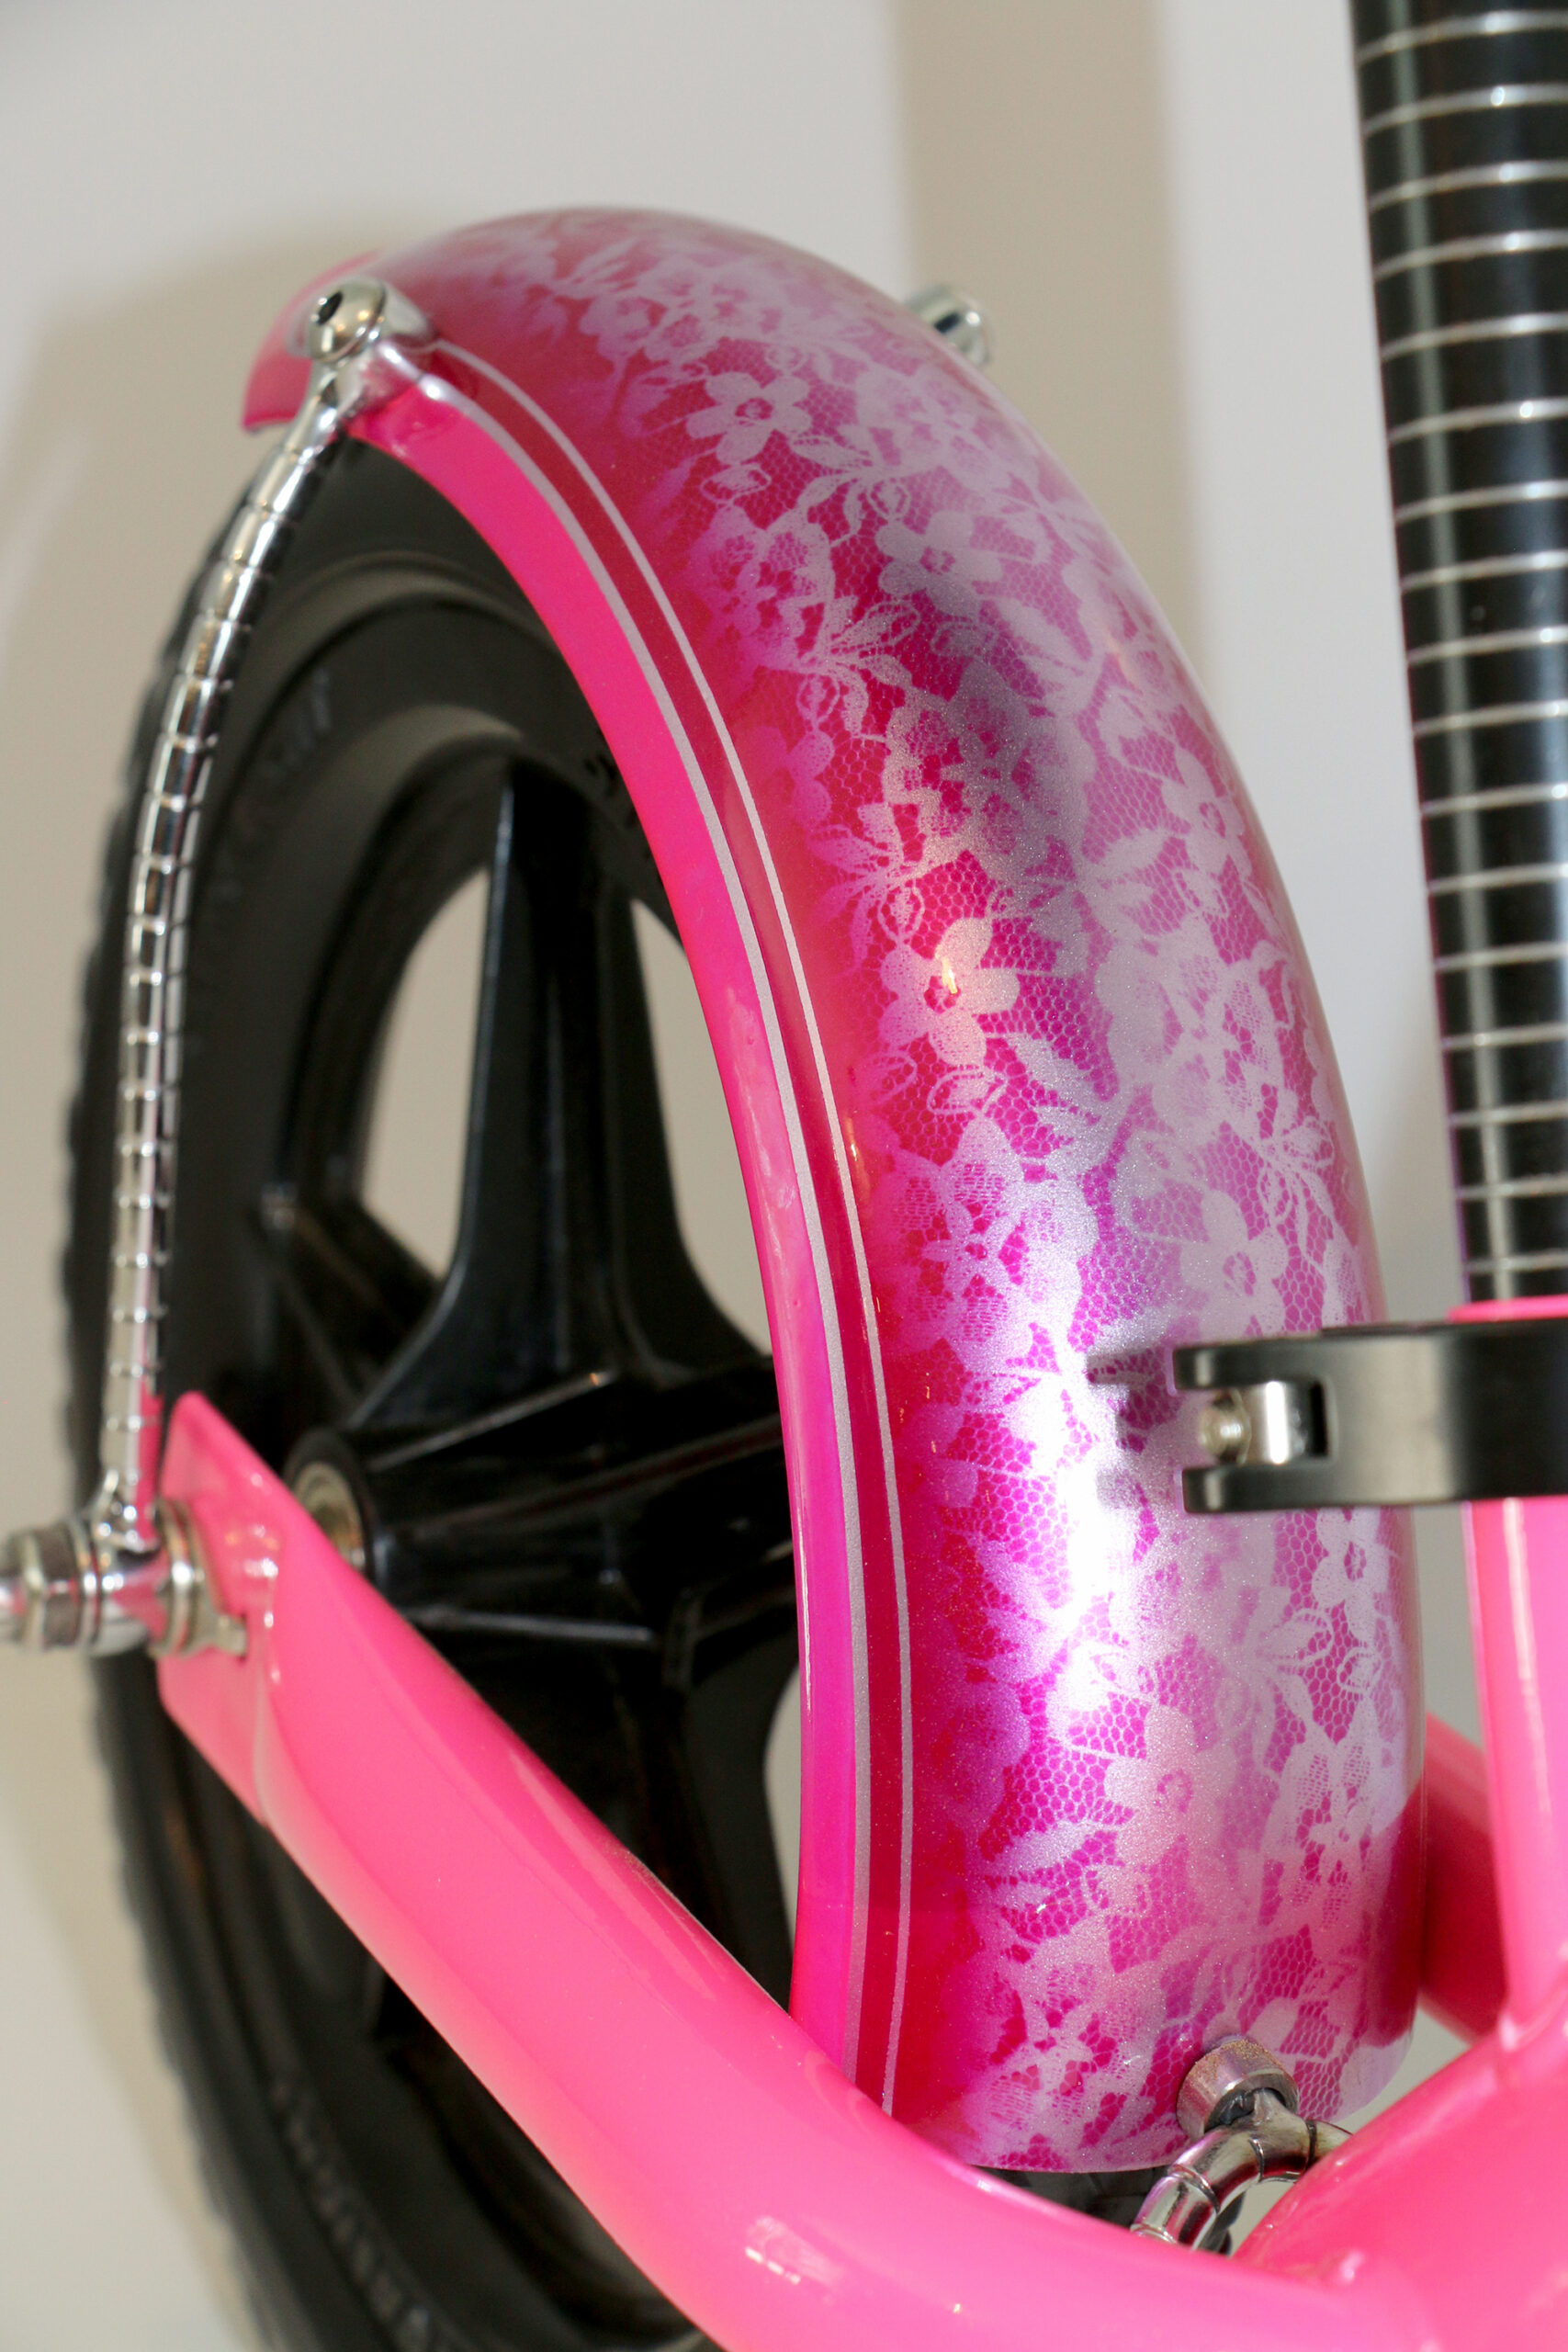 Buckcherry drummer Builds Custom Bike